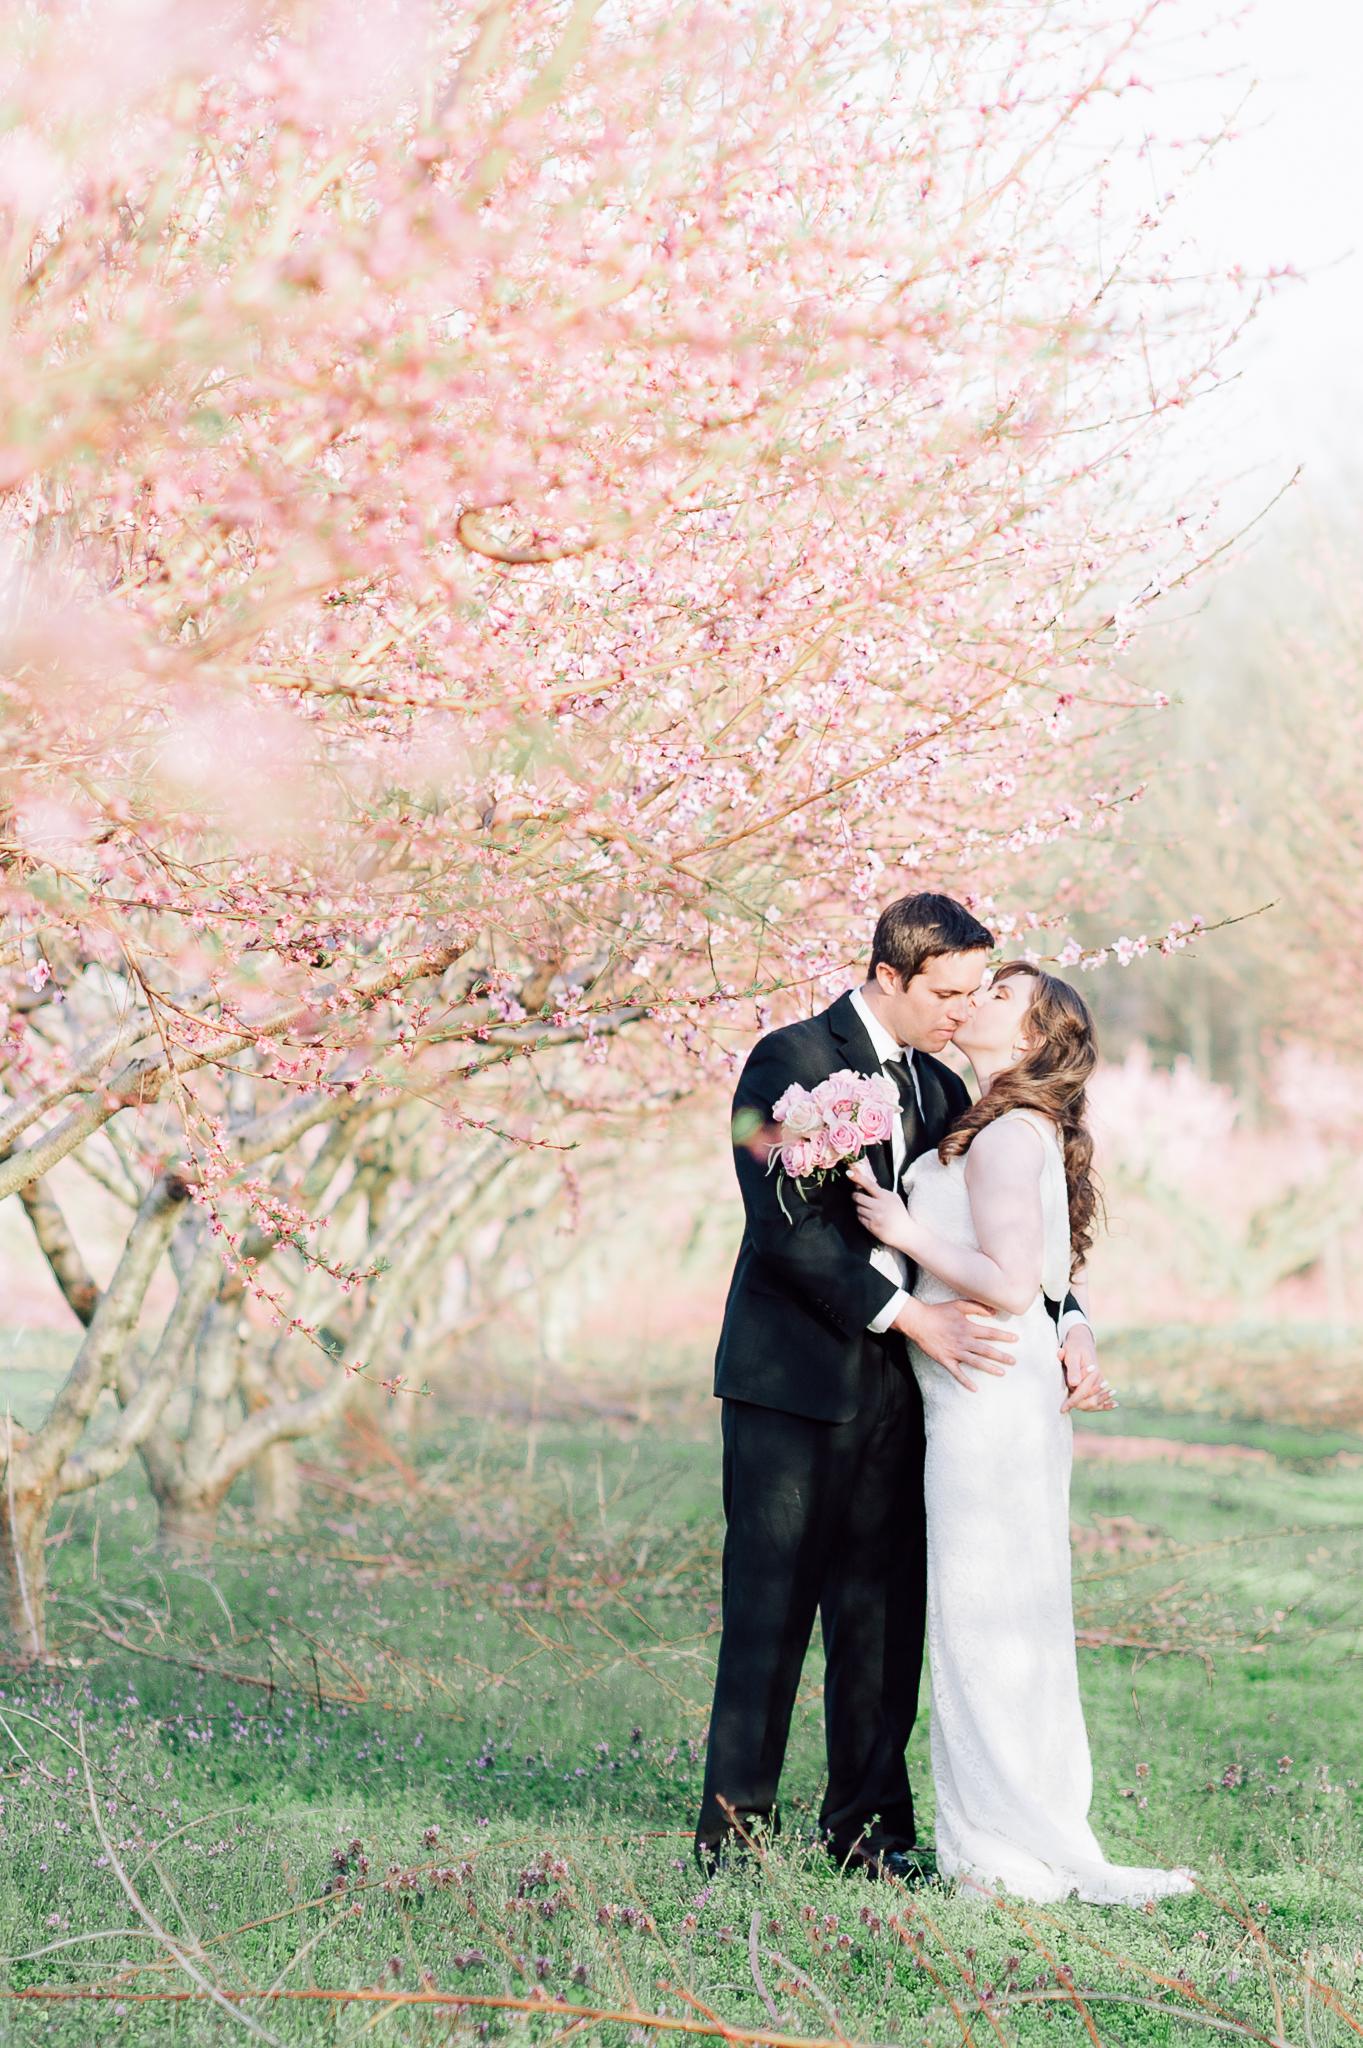 springwedding_cherryblossoms_virginiaphotographer_youseephotography_styledshoot (582).jpg